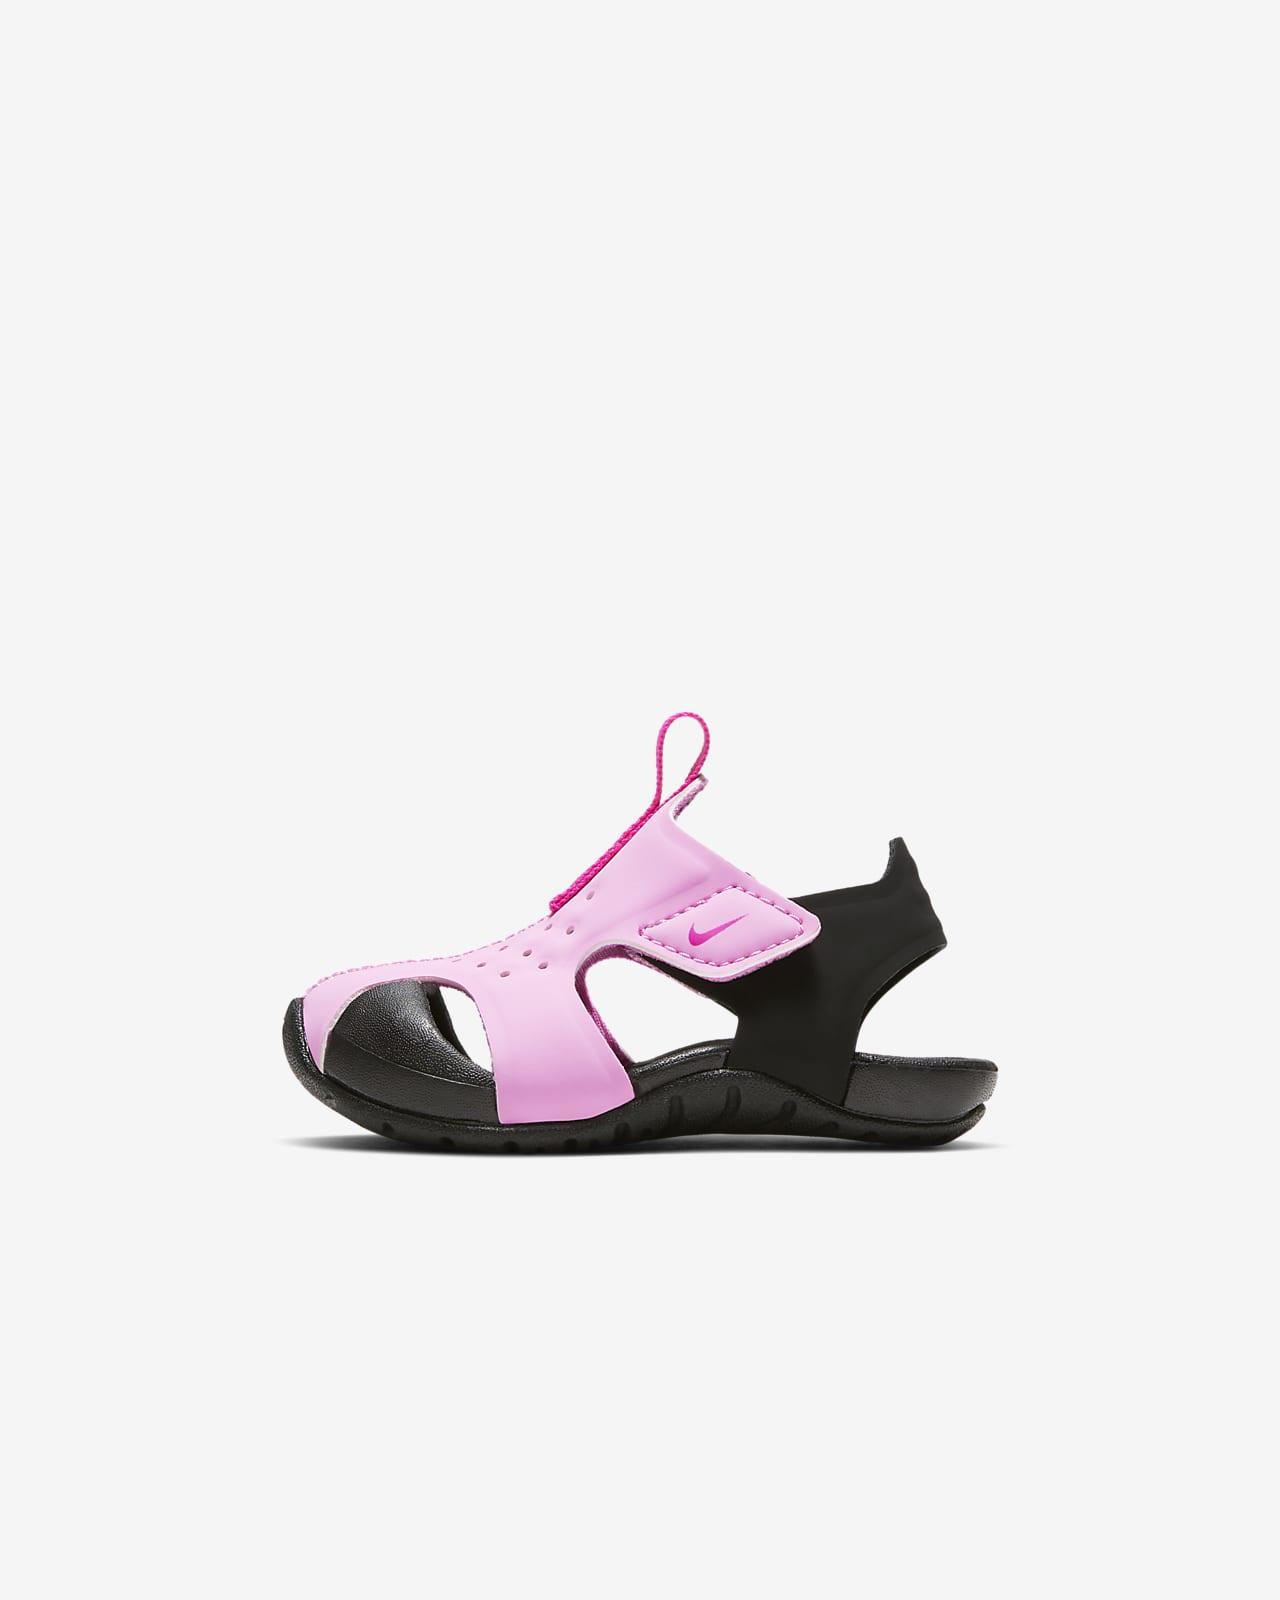 Nike Sunray Protect 2-sandal til babyer/småbørn